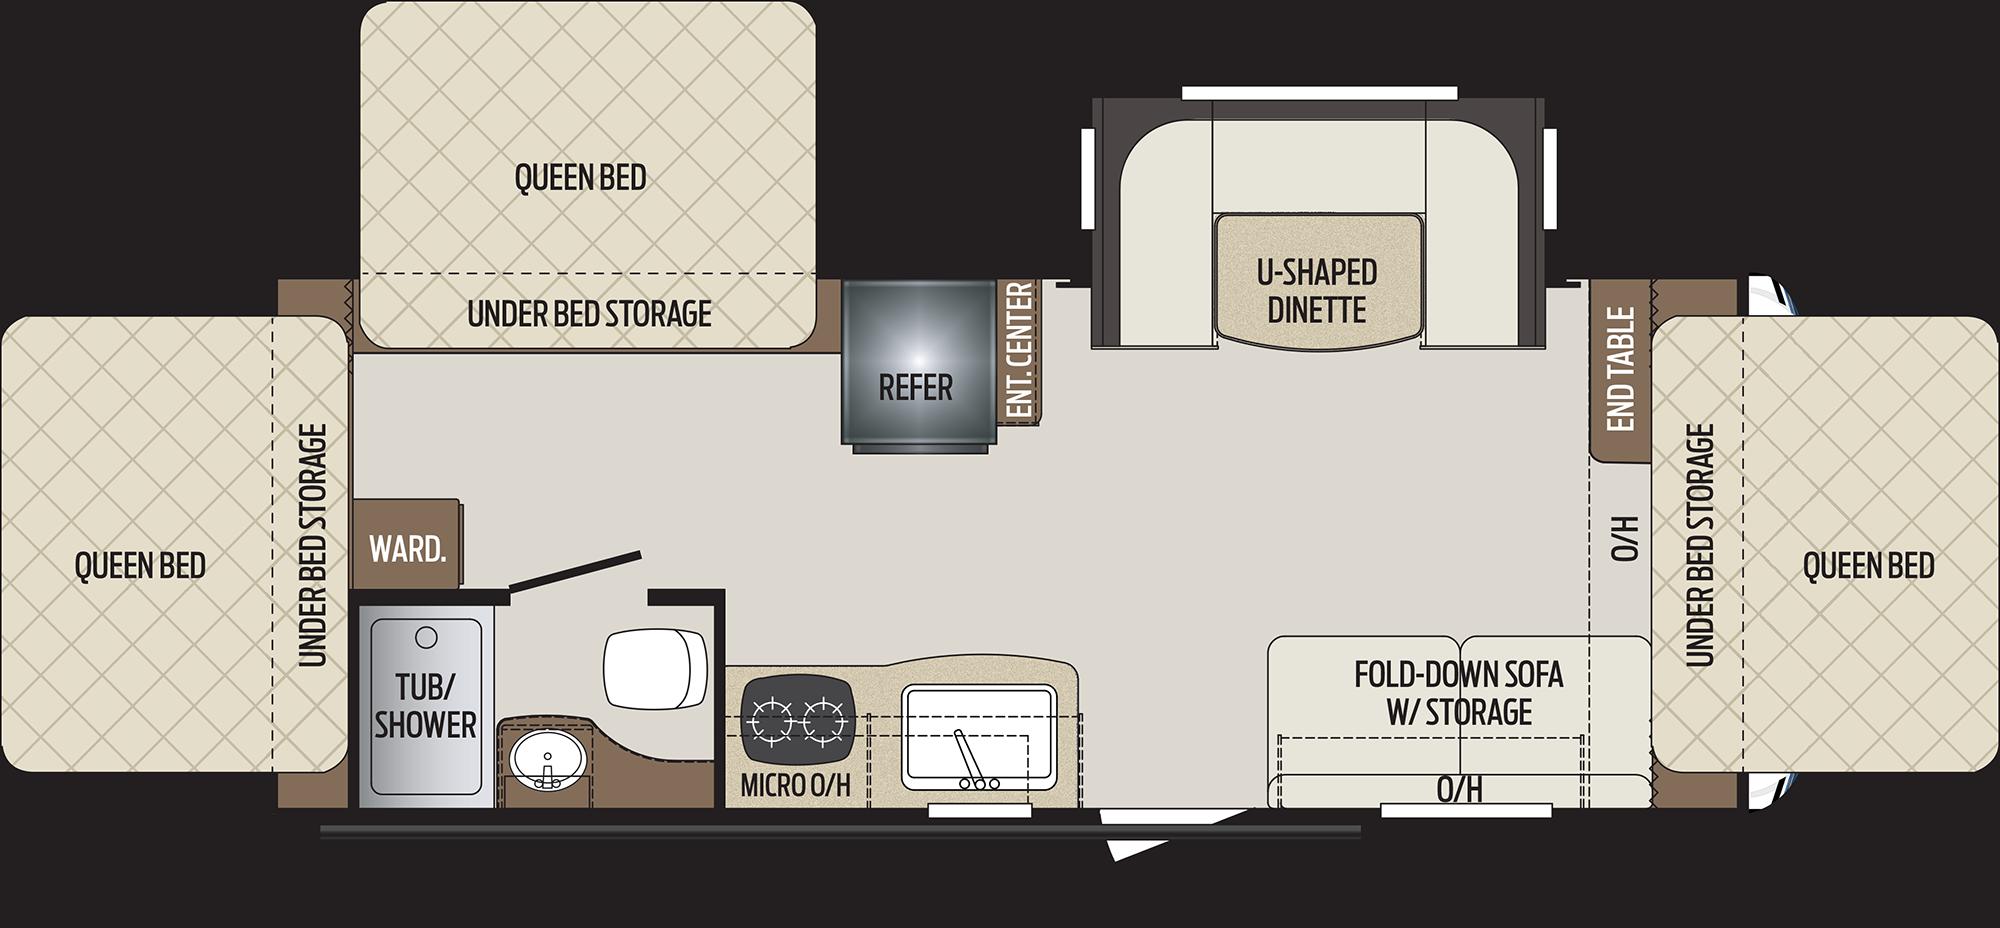 2020 KEYSTONE BULLET CROSSFIRE 2190EX (bunks) Floorplan